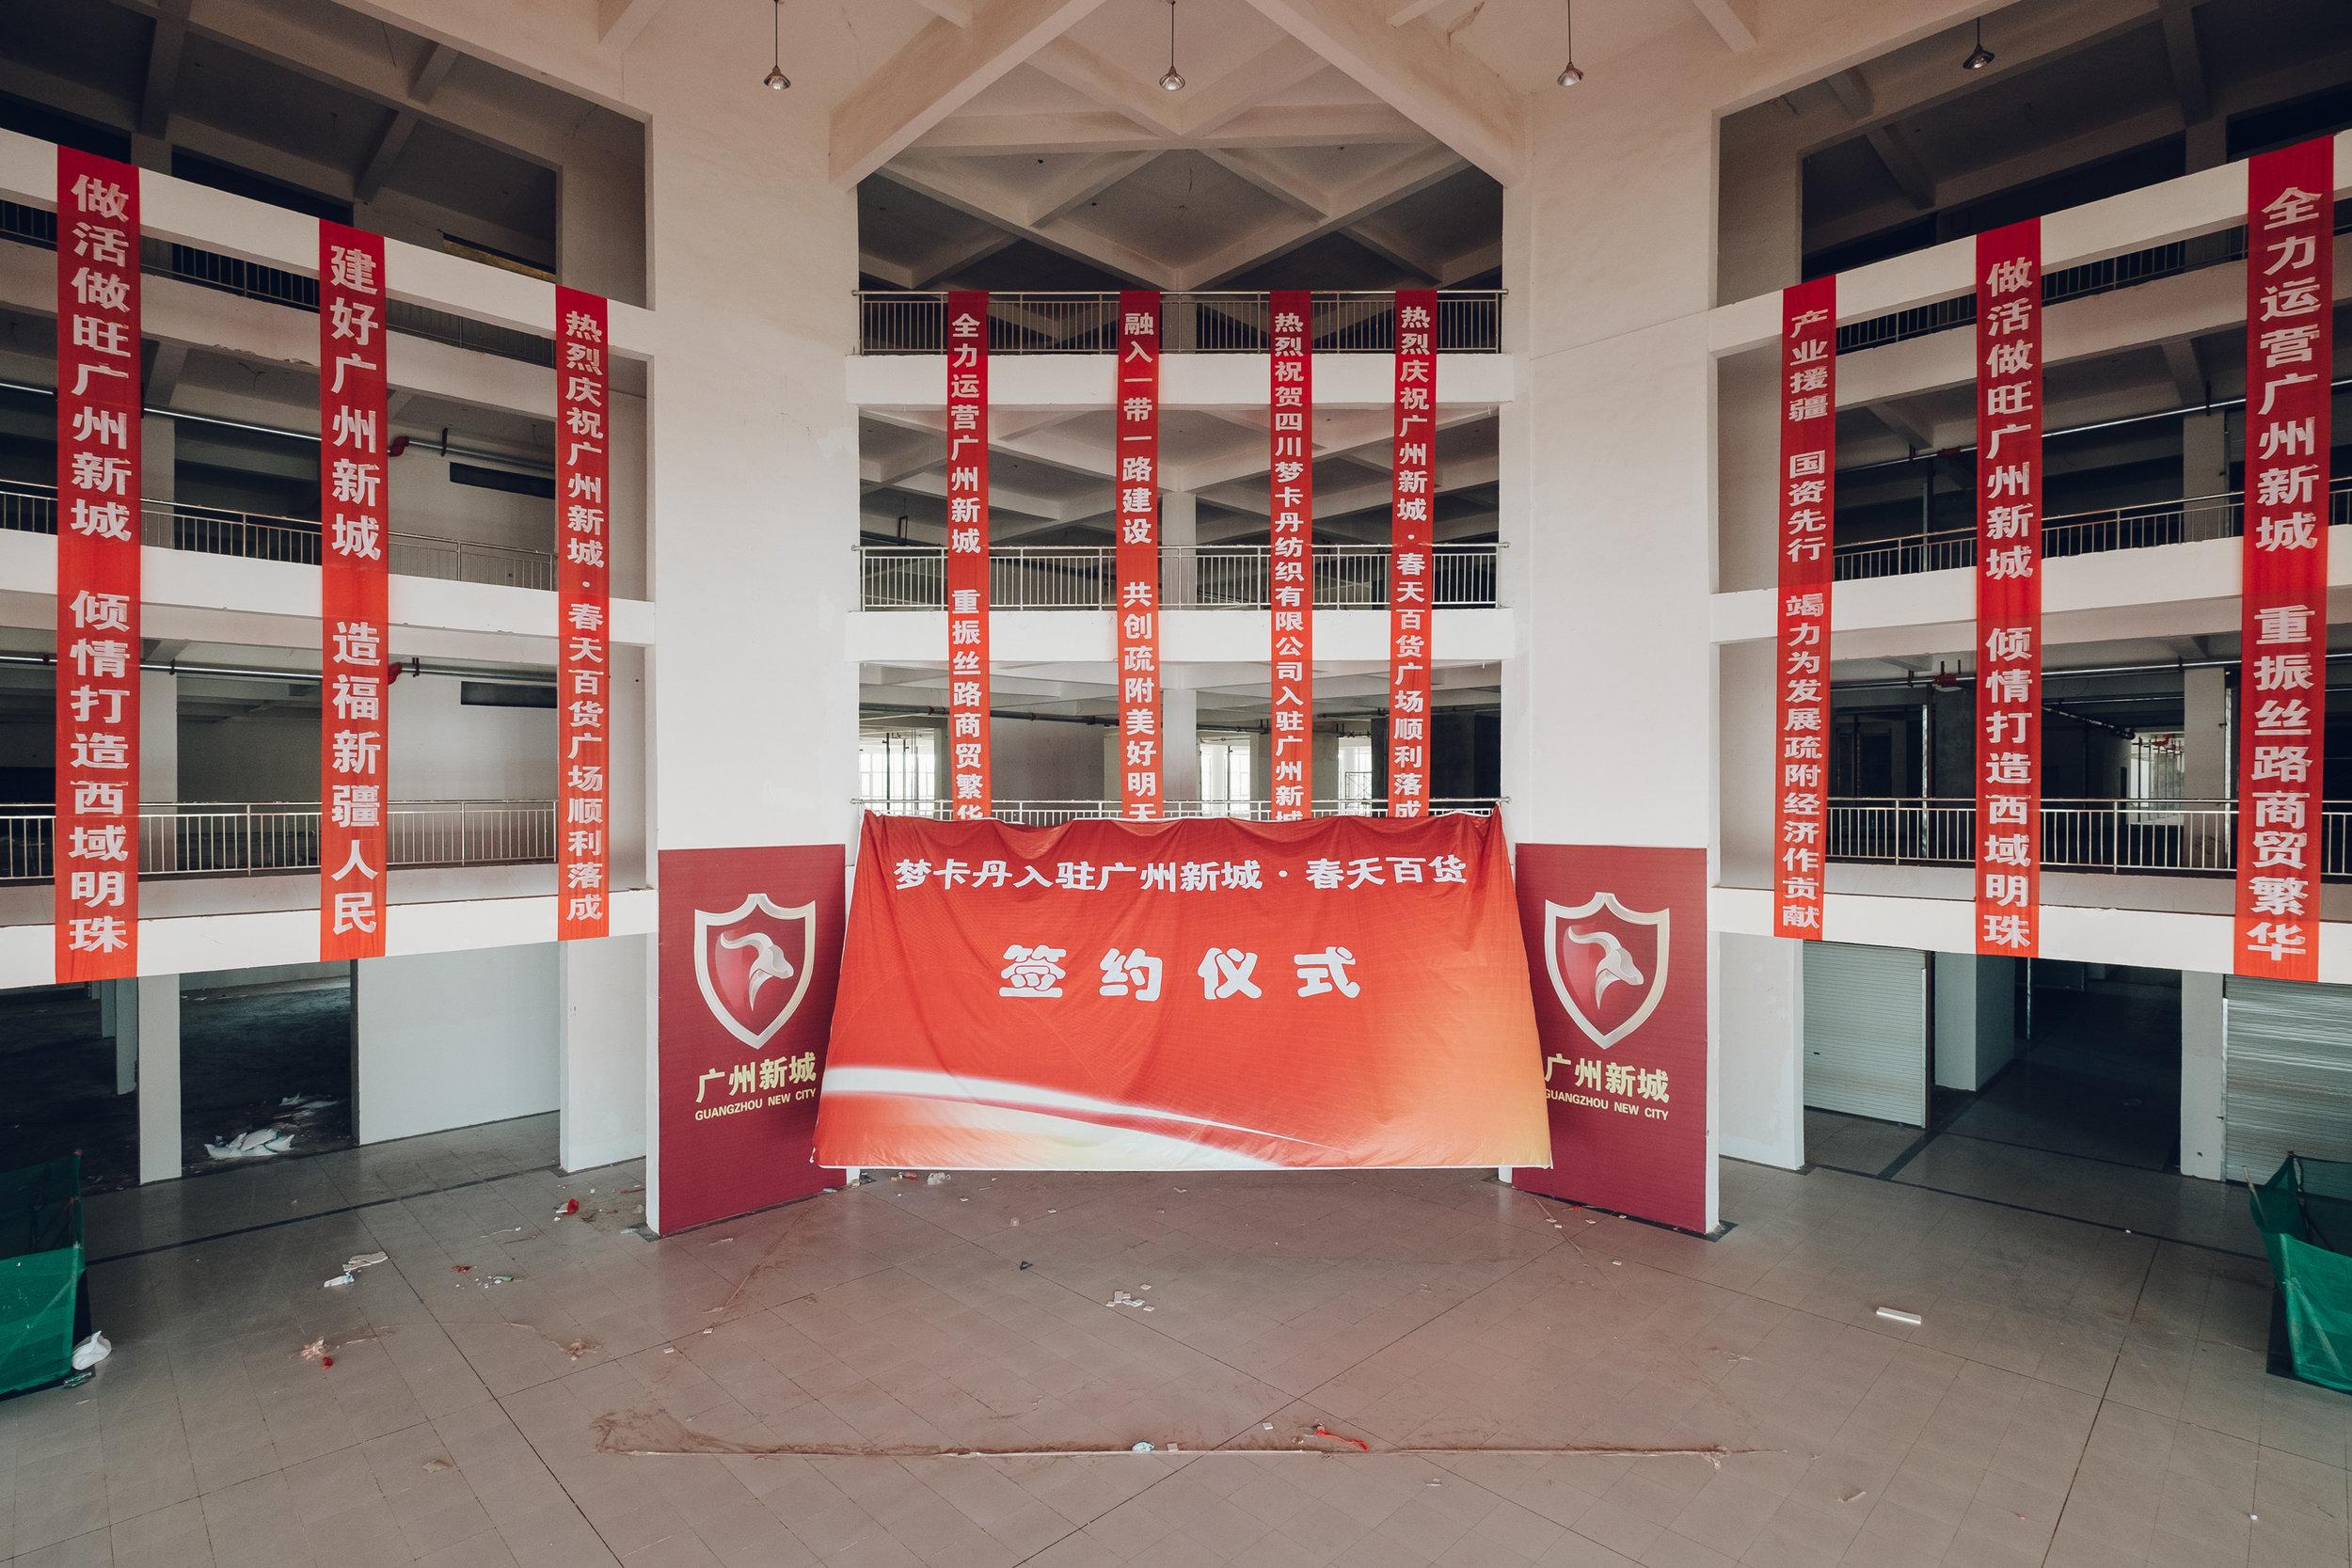 The Newer New Frontier-12-yuyang-liu-photography-of-china.jpg